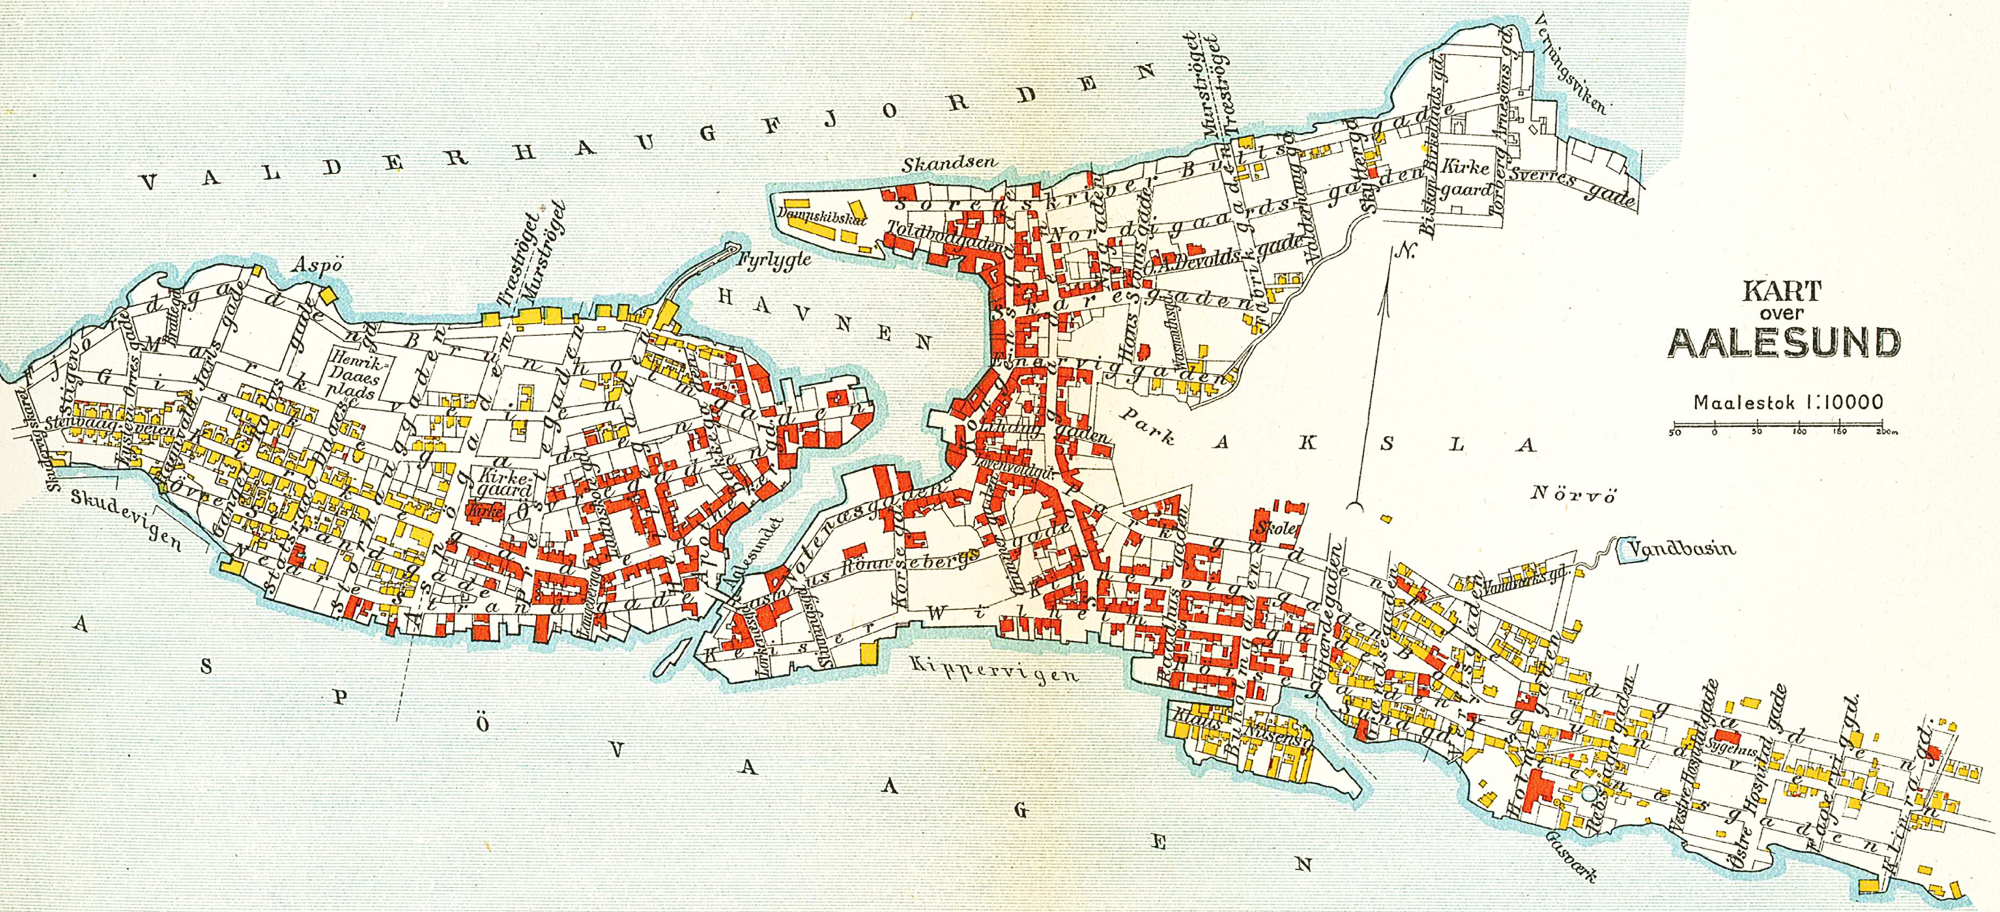 ålesund kart File:Ålesund map 1911.   Wikimedia Commons